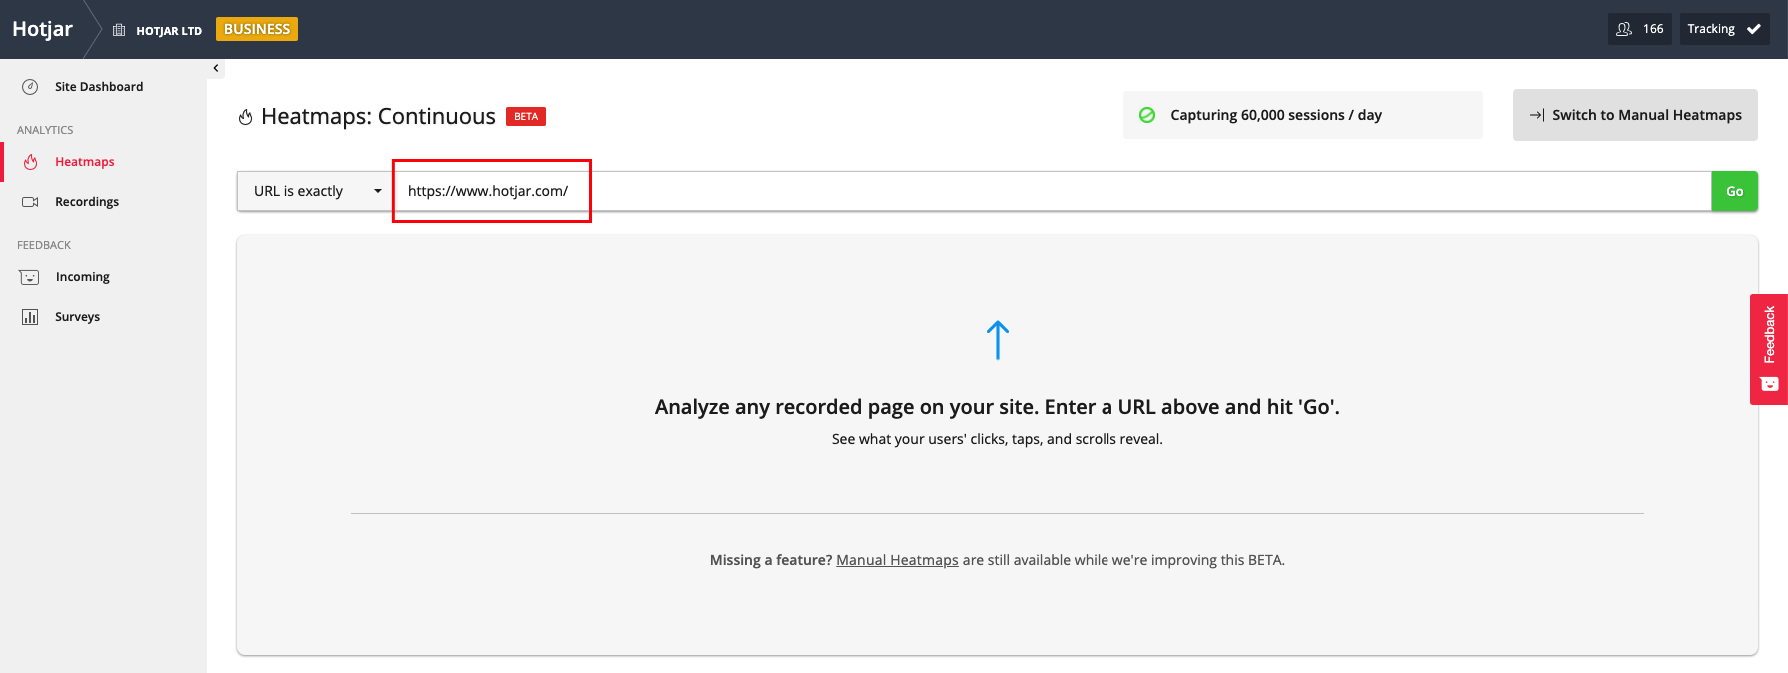 screenshot of Heatmap search bar